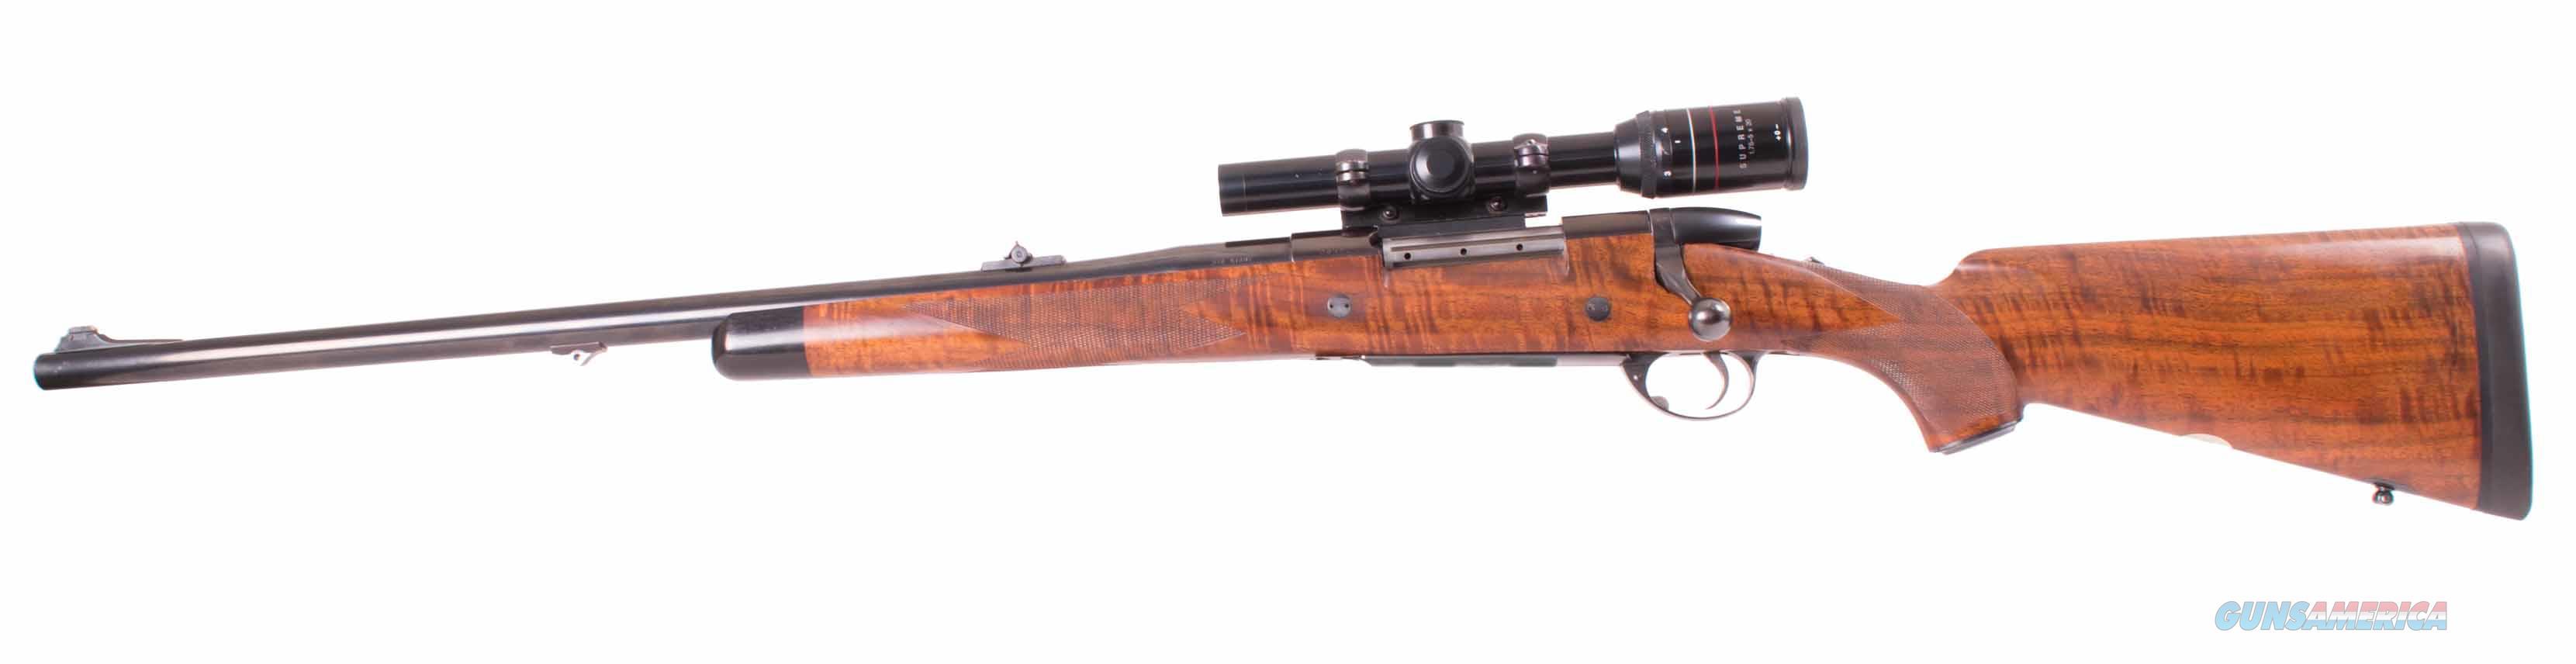 BILL DOWTIN CUSTOM BOLT RIFLE, .416 Rigby LEFT HAND, GORGEOUS, vintage firearms inc   Guns > Rifles > Custom Rifles > Bolt Action